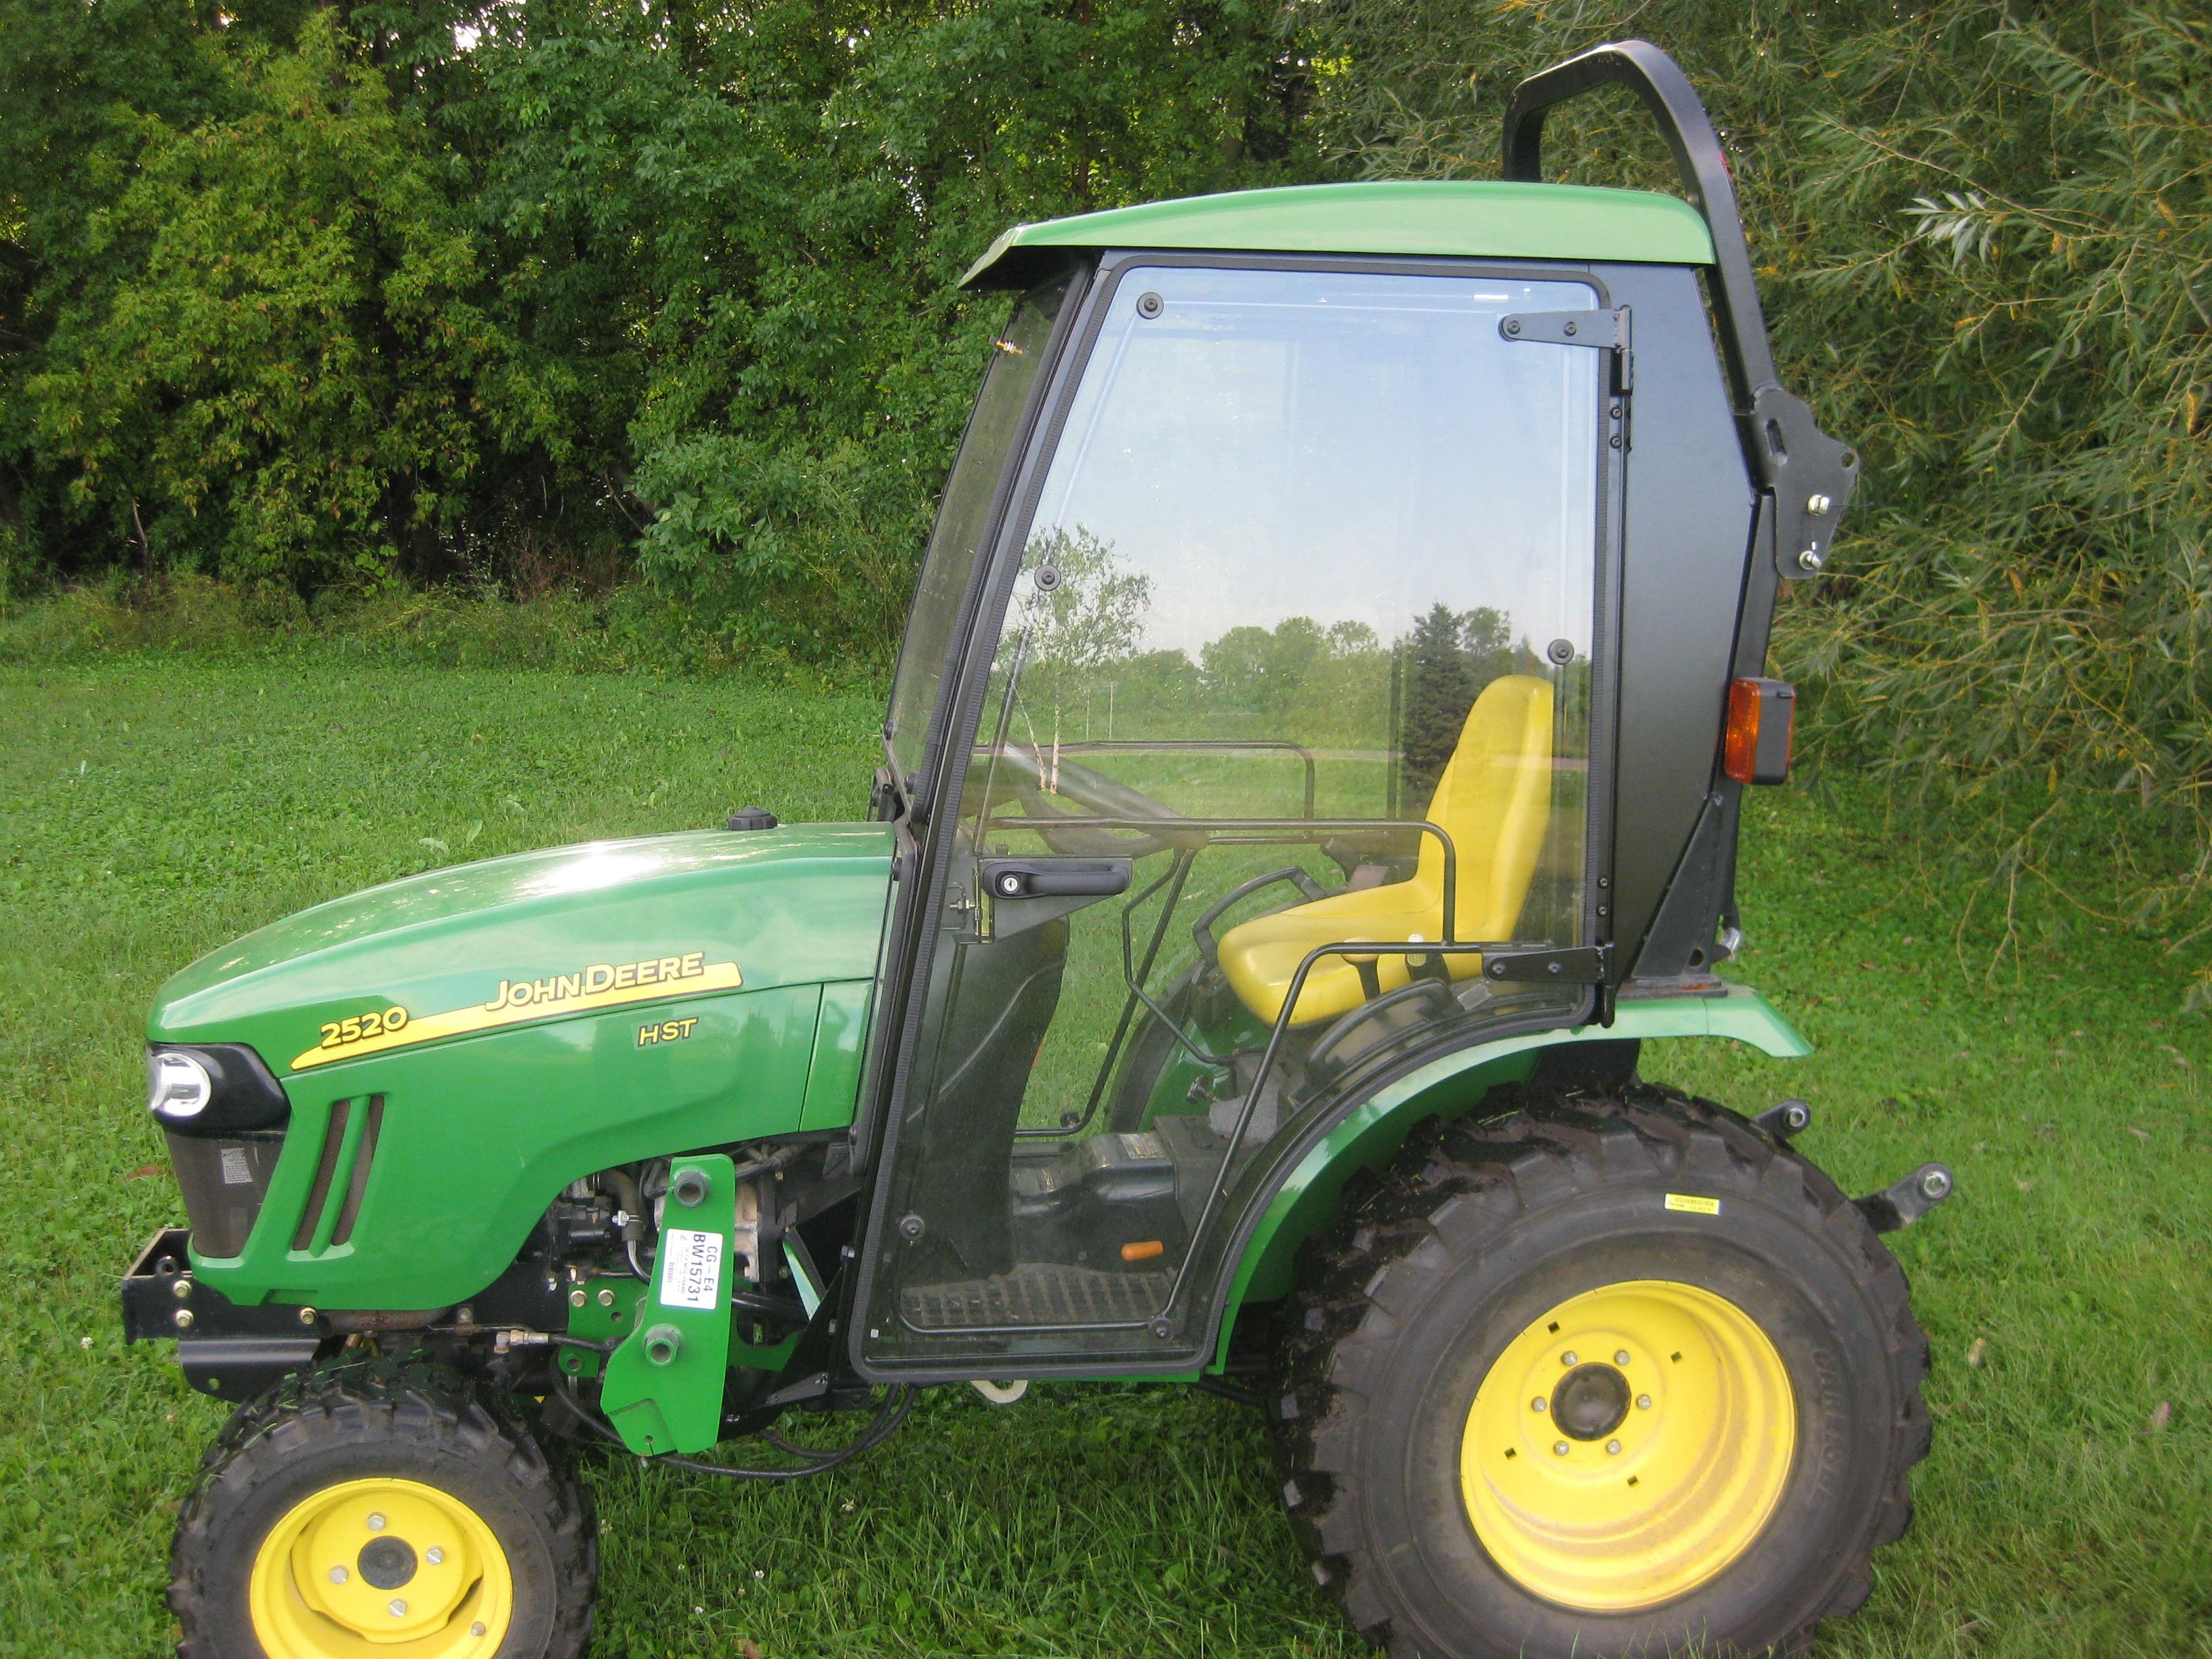 John Deere 2520 Lawn Tractor Images Of Home Design Jd Wiring Diagram 5105 Diagrams M